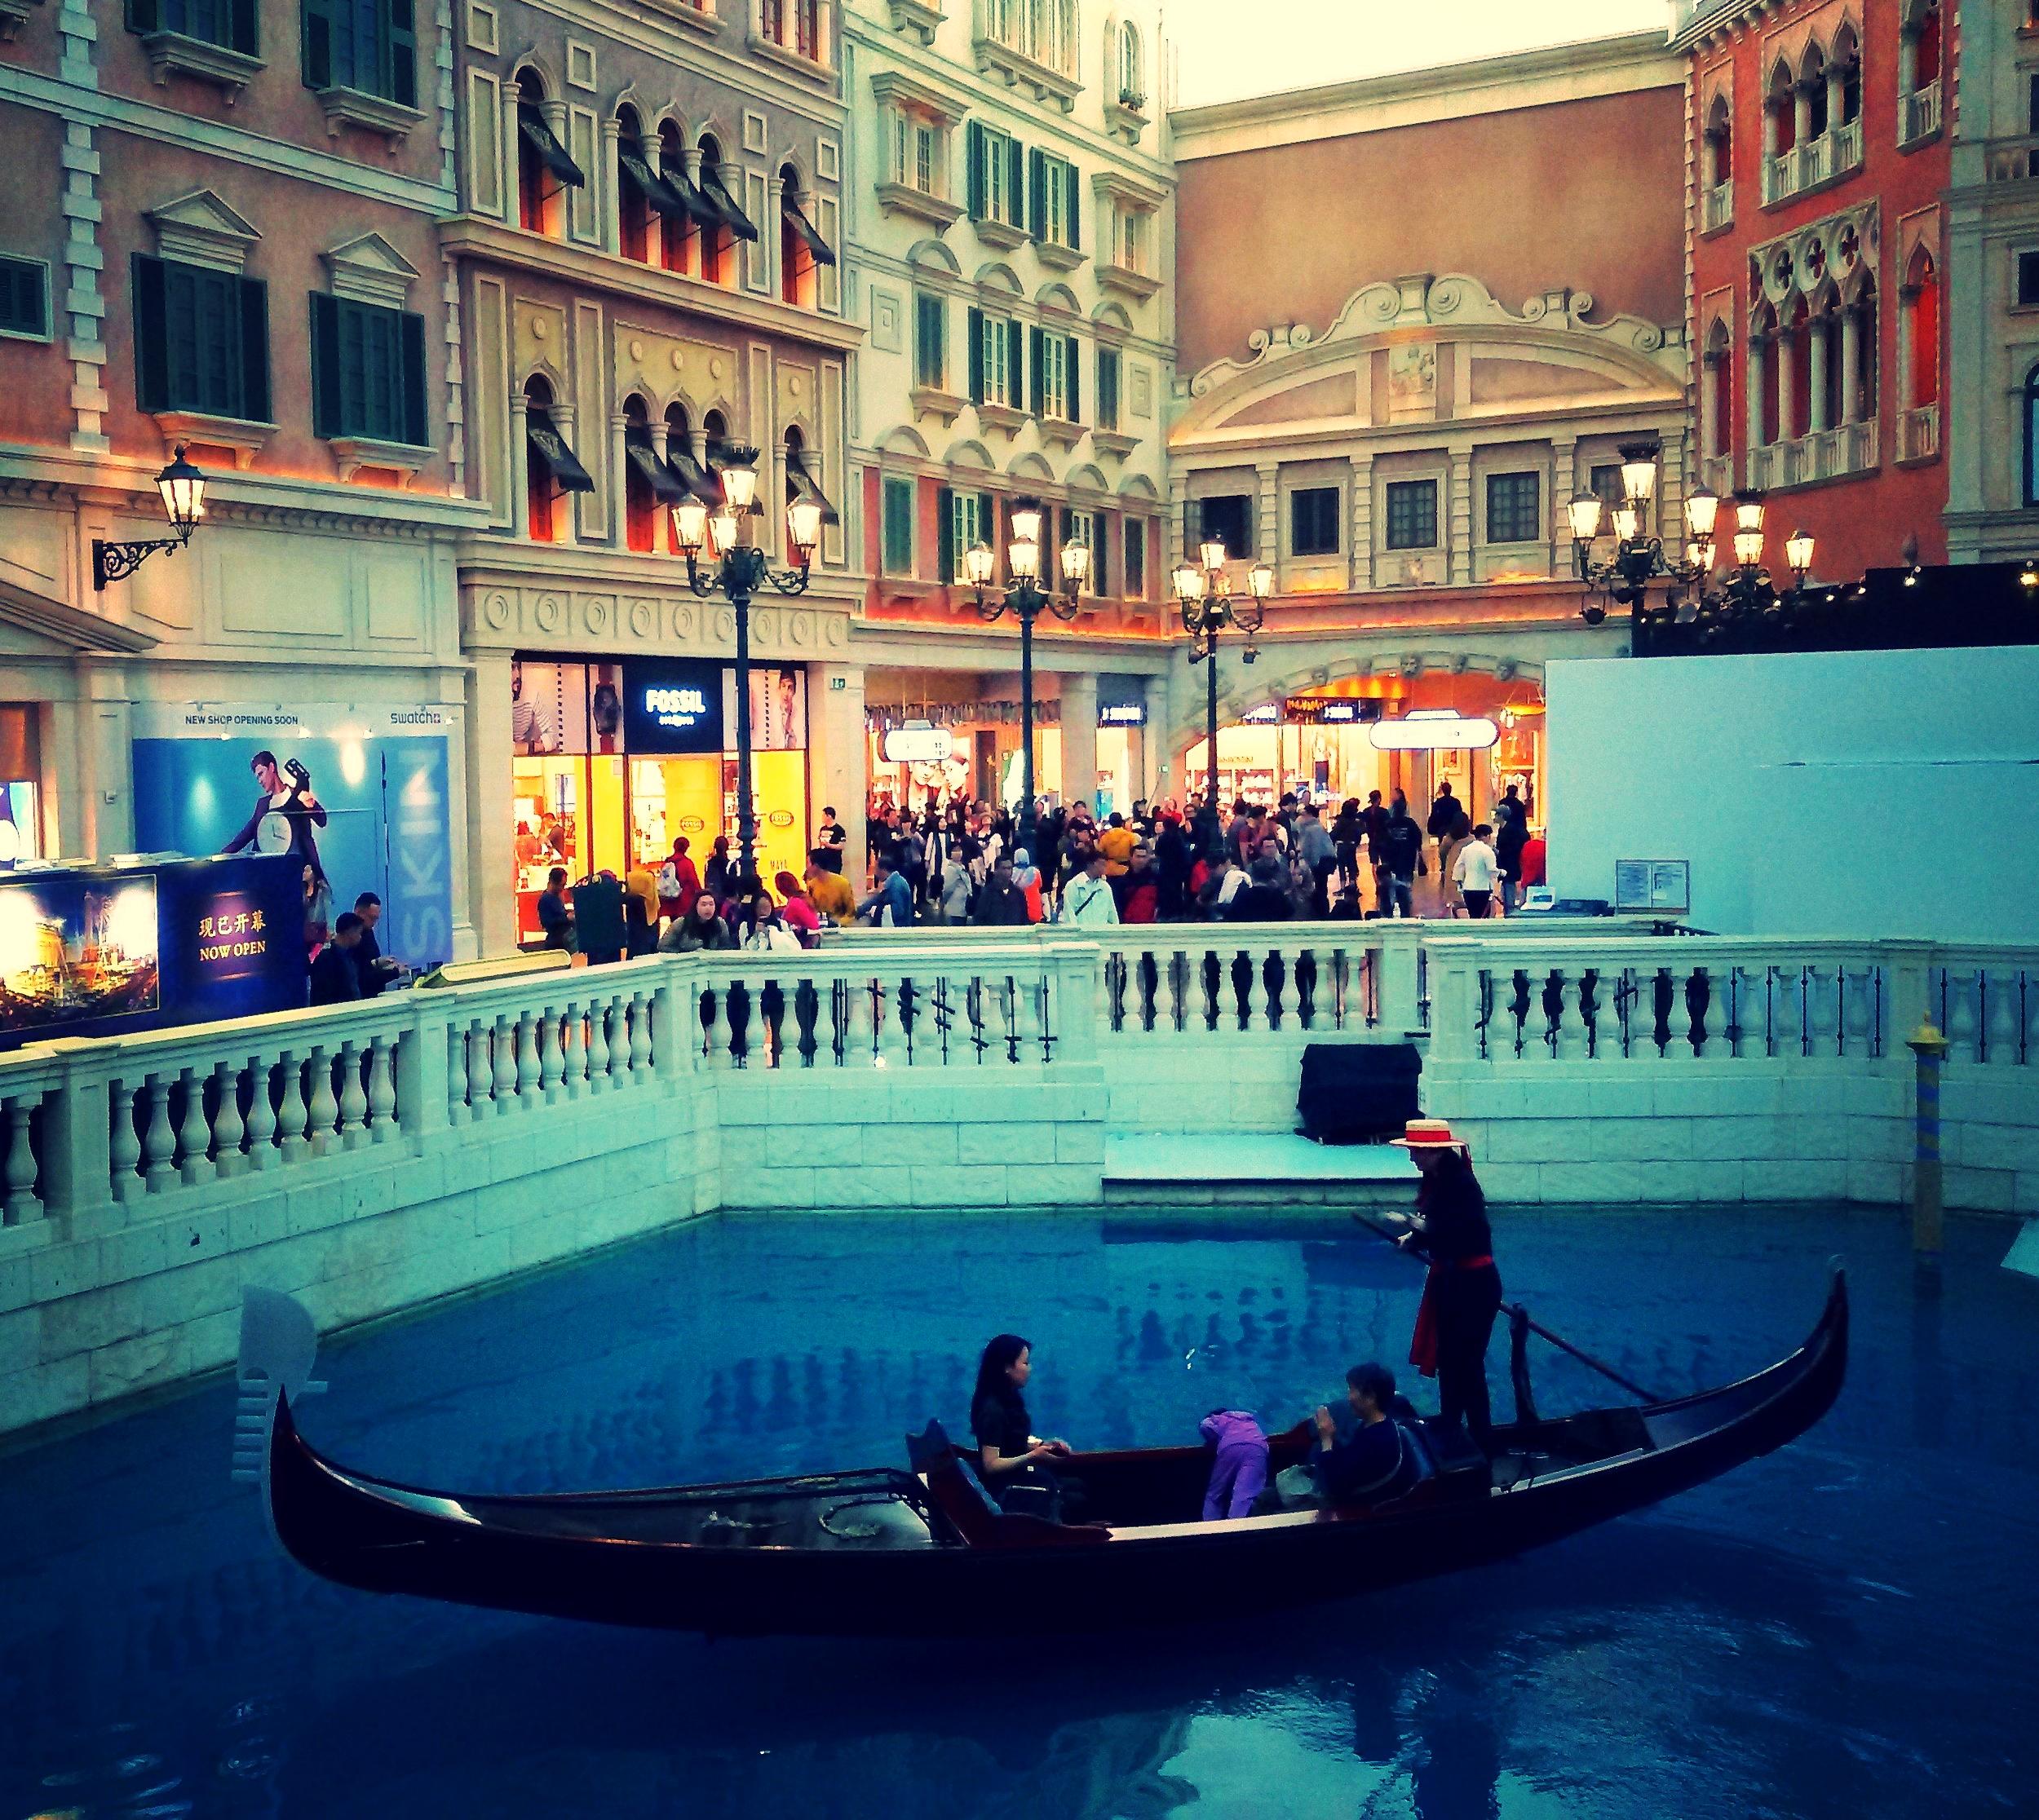 Inside the Venetian: fake lagoon